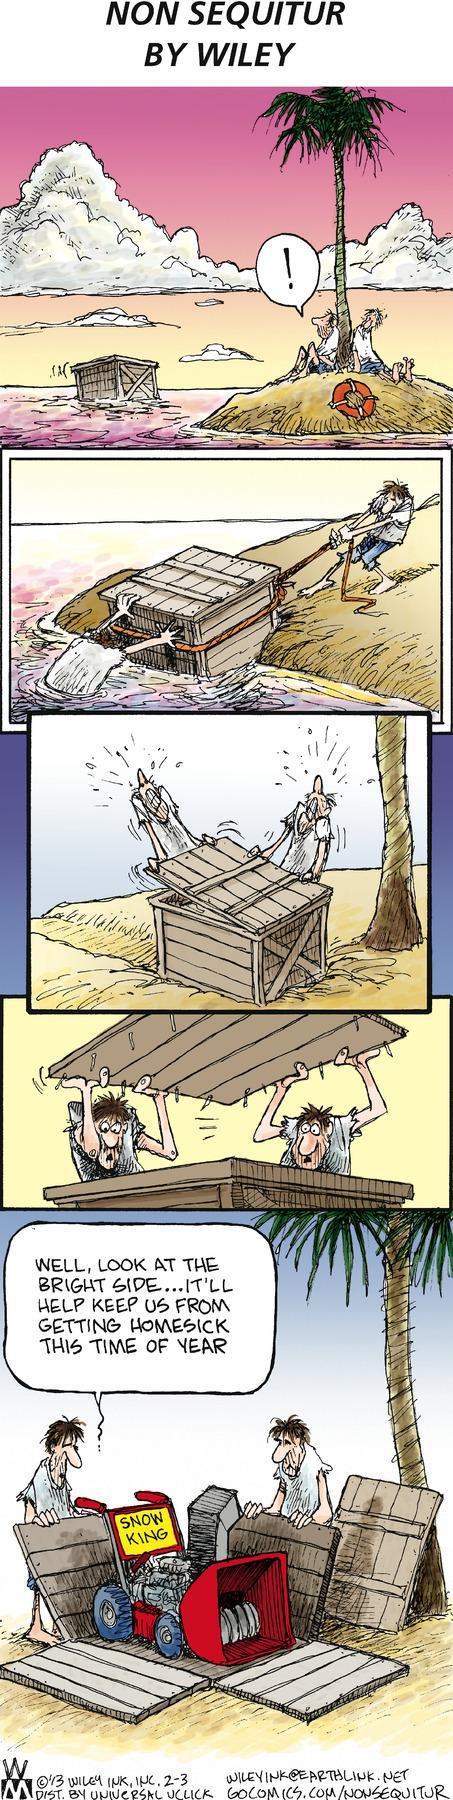 Non Sequitur Comic Strip for February 03, 2013